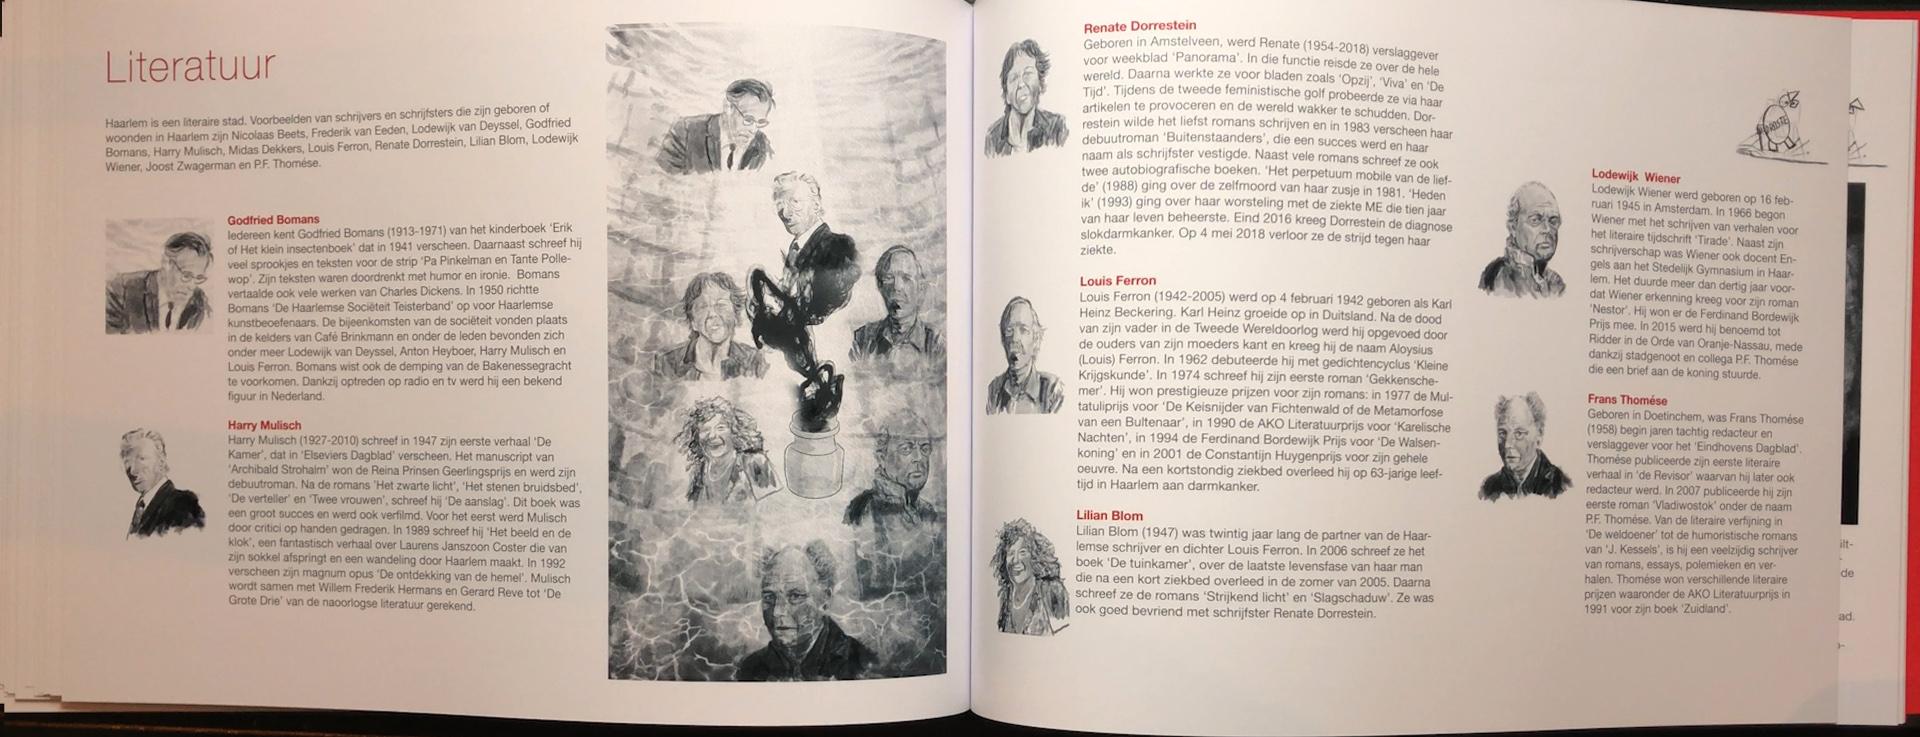 Het Spaarne Stroomt -Ode aan Haarlem Literatuur